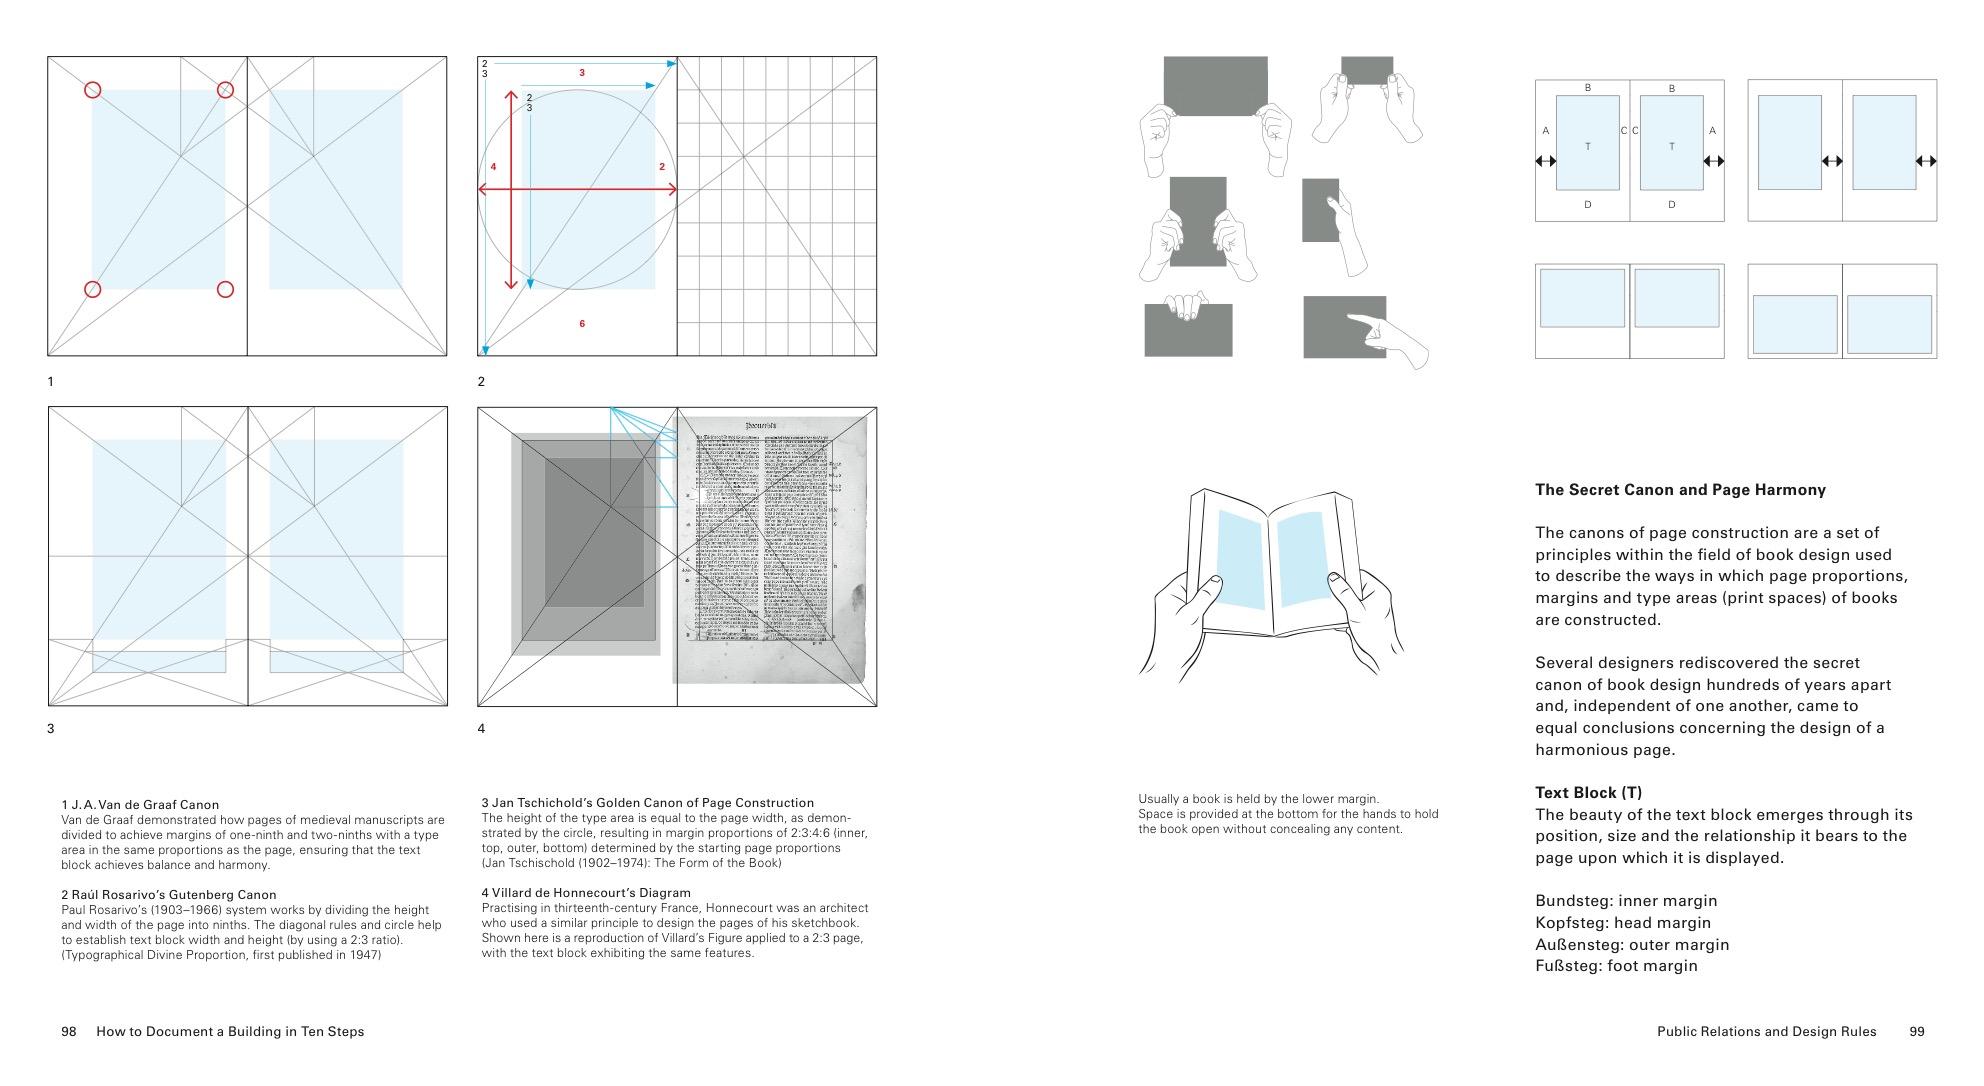 Public Relations Prof Dr Natascha Meuser Gutenberg Printing Press Diagram Wh 15 Sem 1 Medieval Mausoleum Ws2016 50jpeg